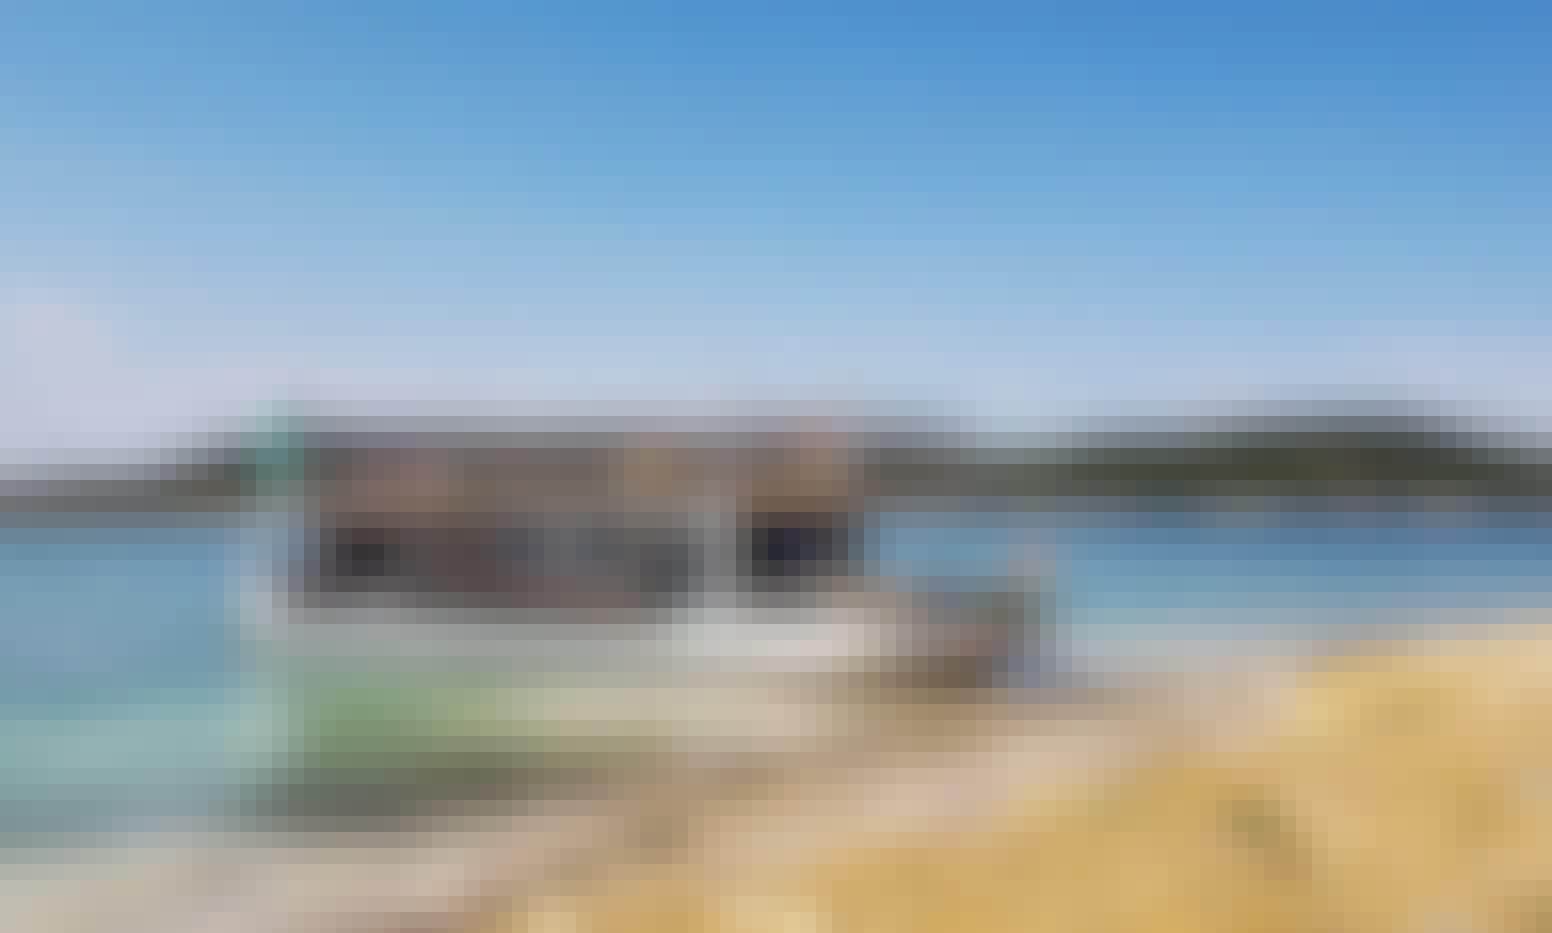 55' Houseboat on Hurst Creek Arm in Lakeway, Texas